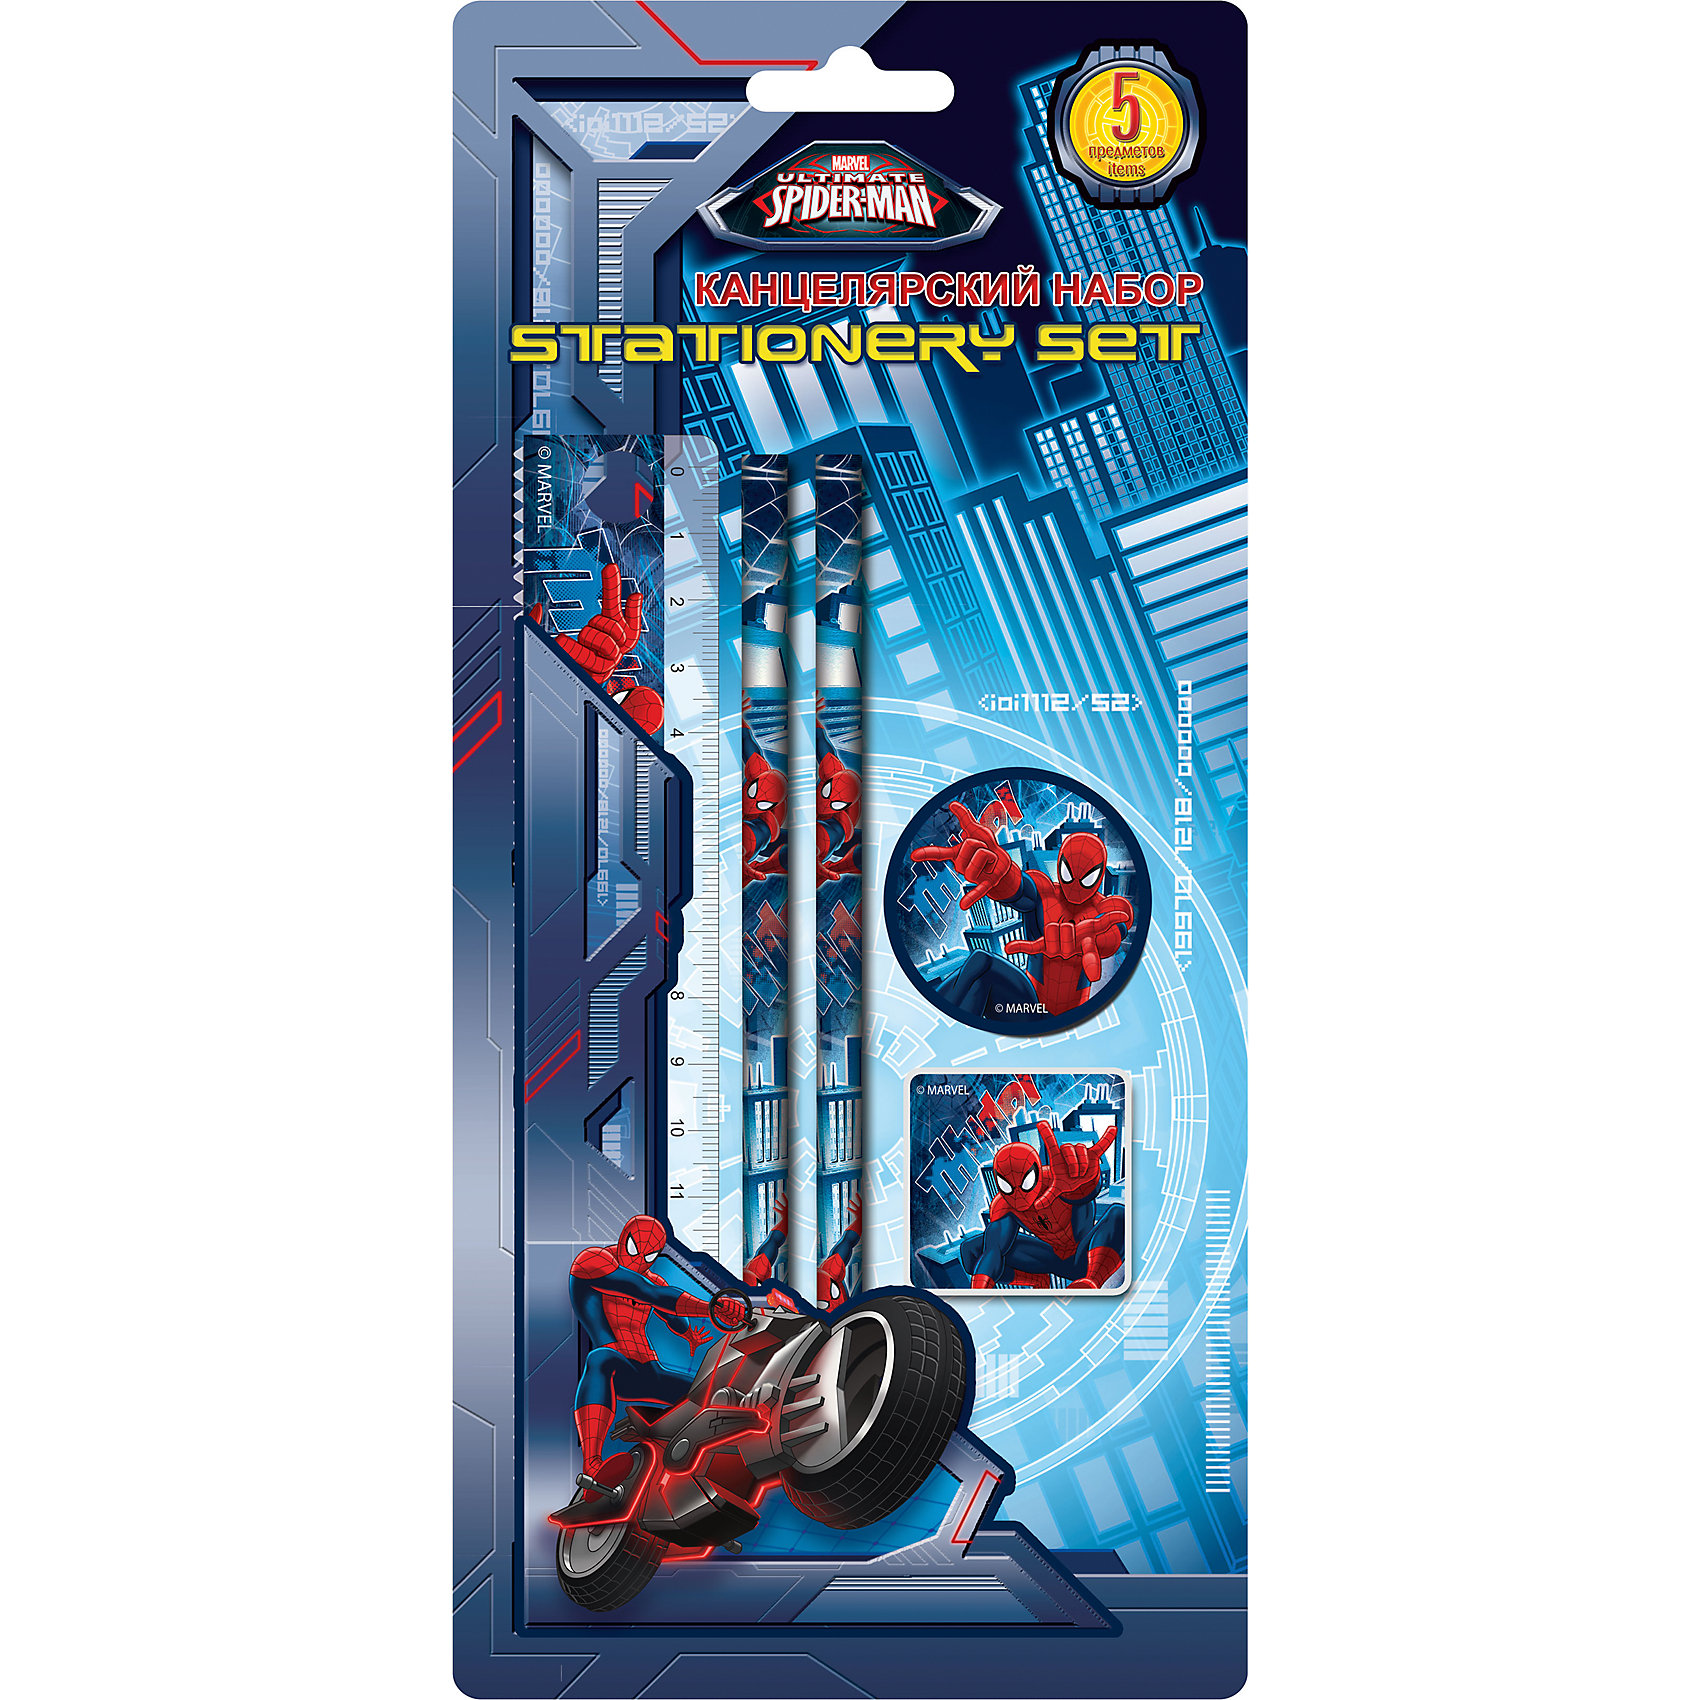 Академия групп Канцелярский набор (5 предметов), Человек-Паук набор канцелярский planes